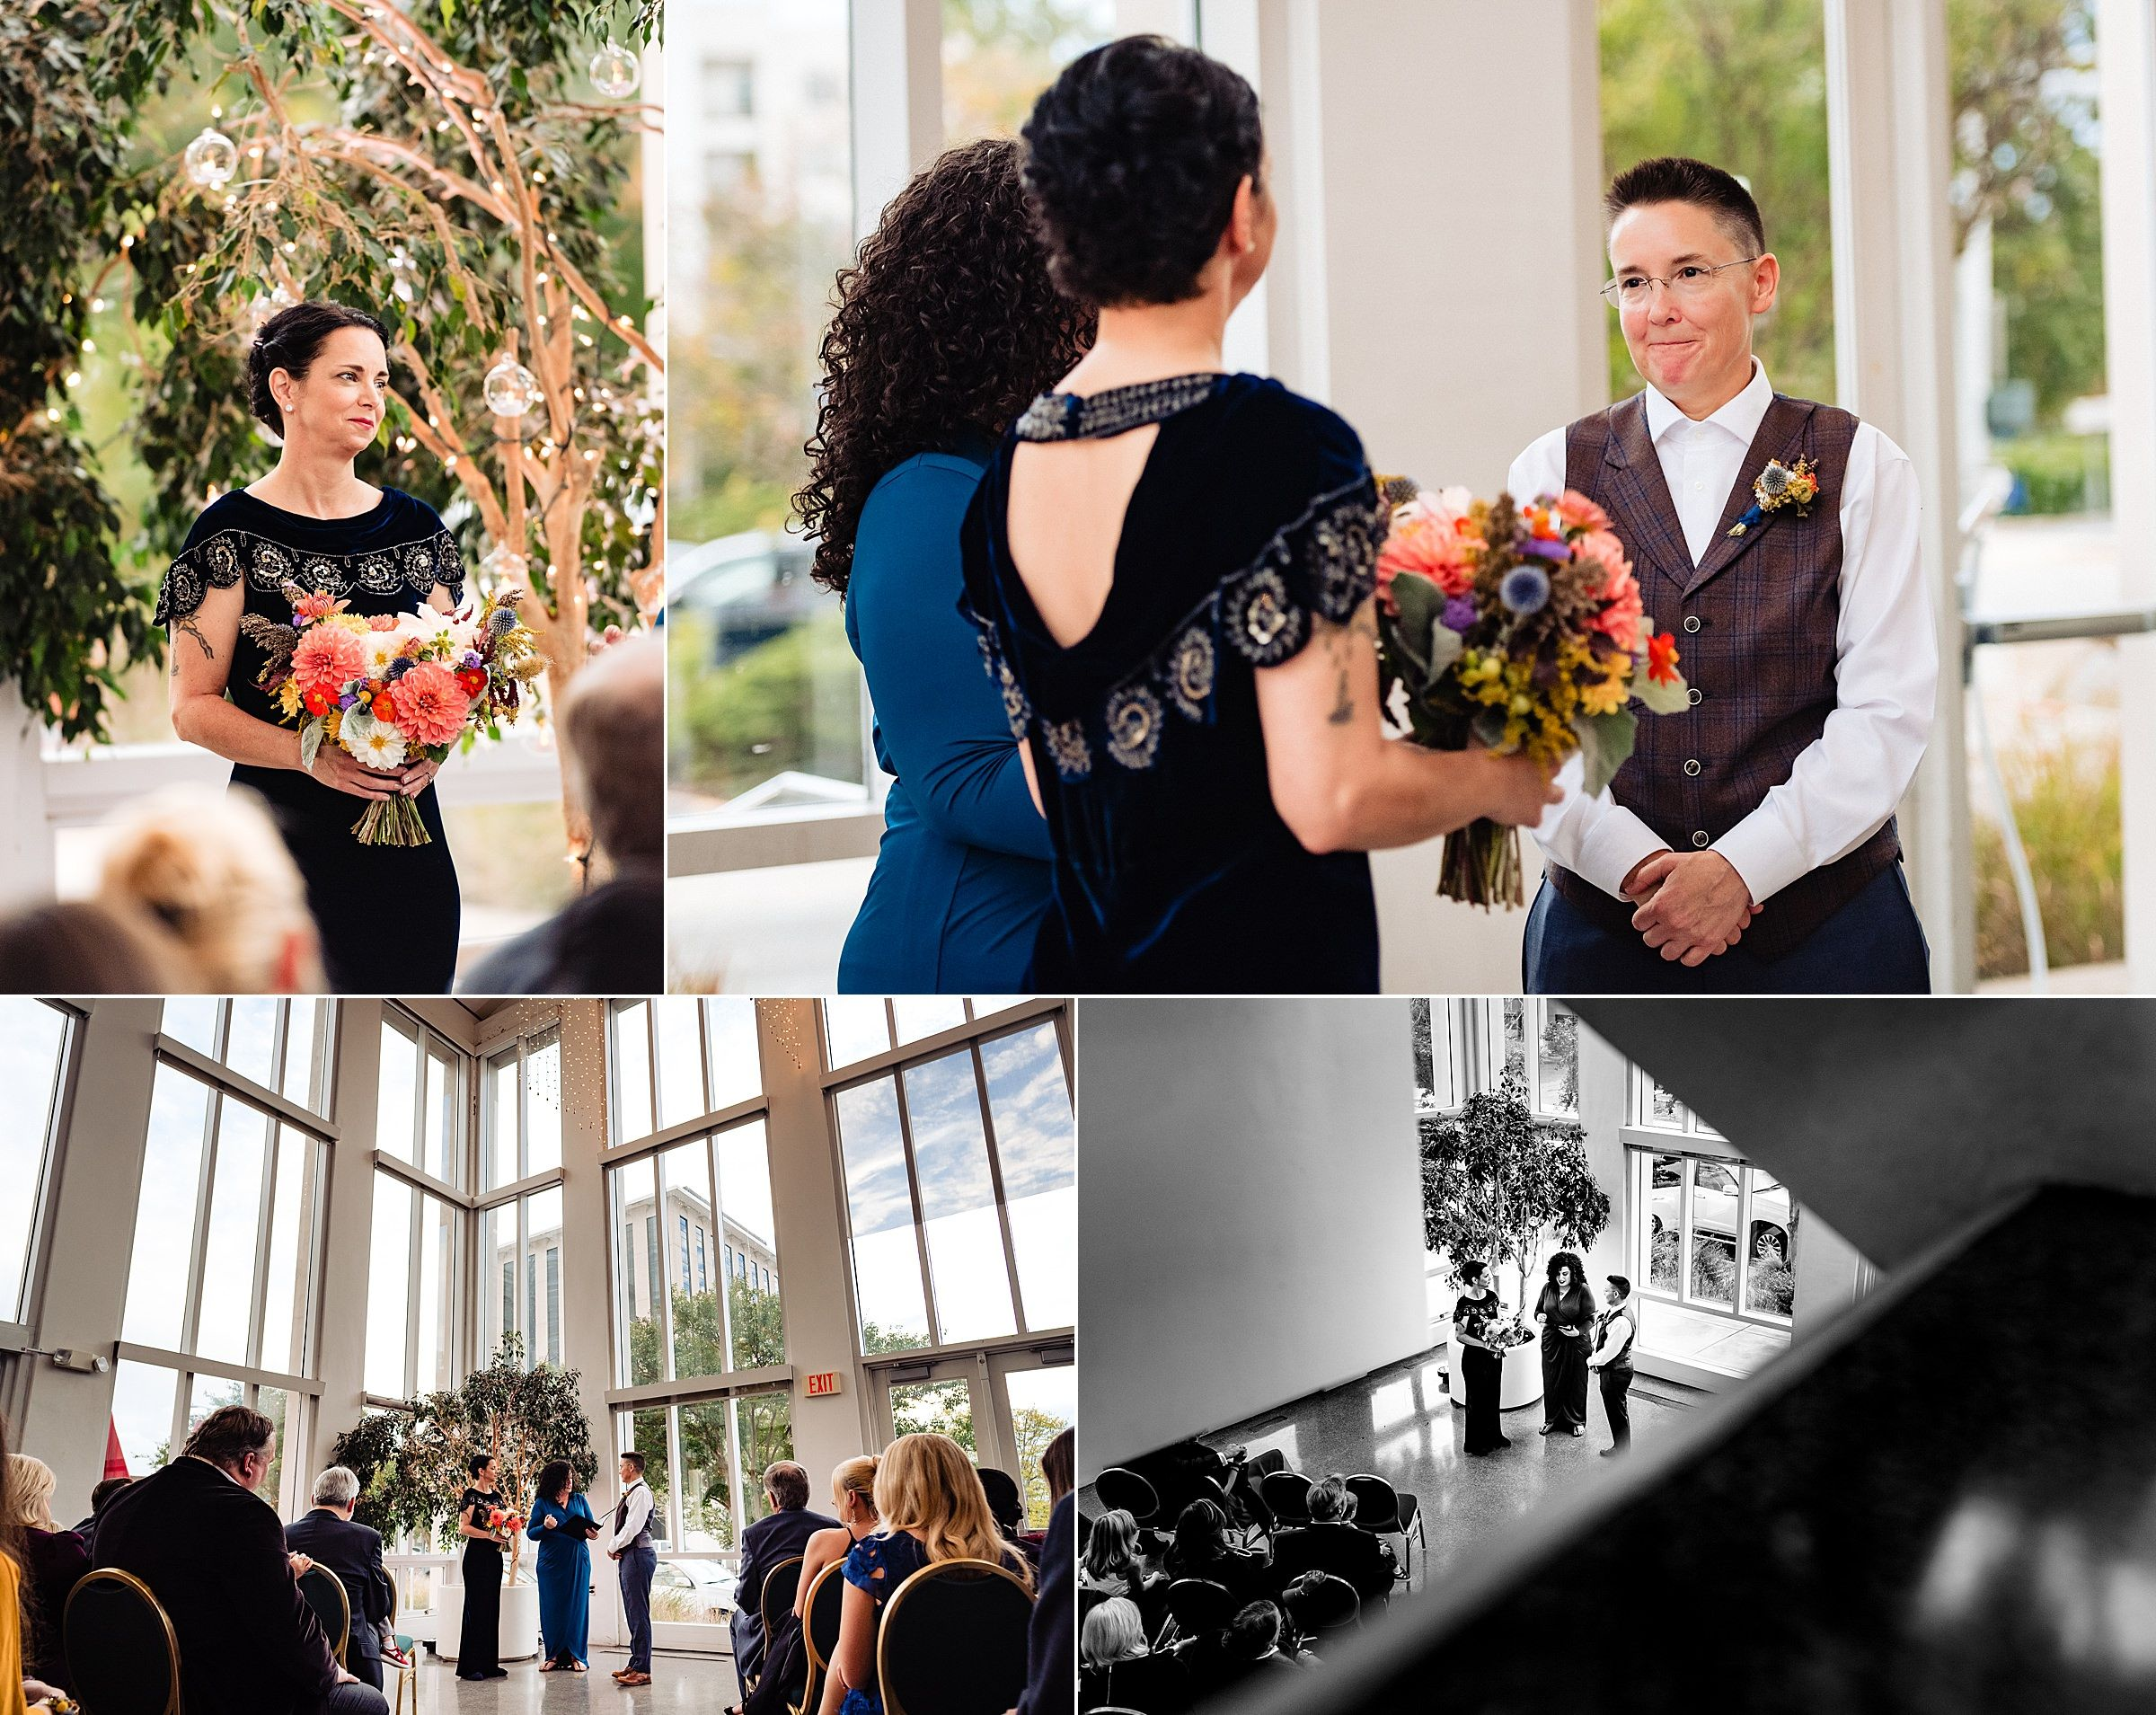 Durham arts council wedding kivus camera durham